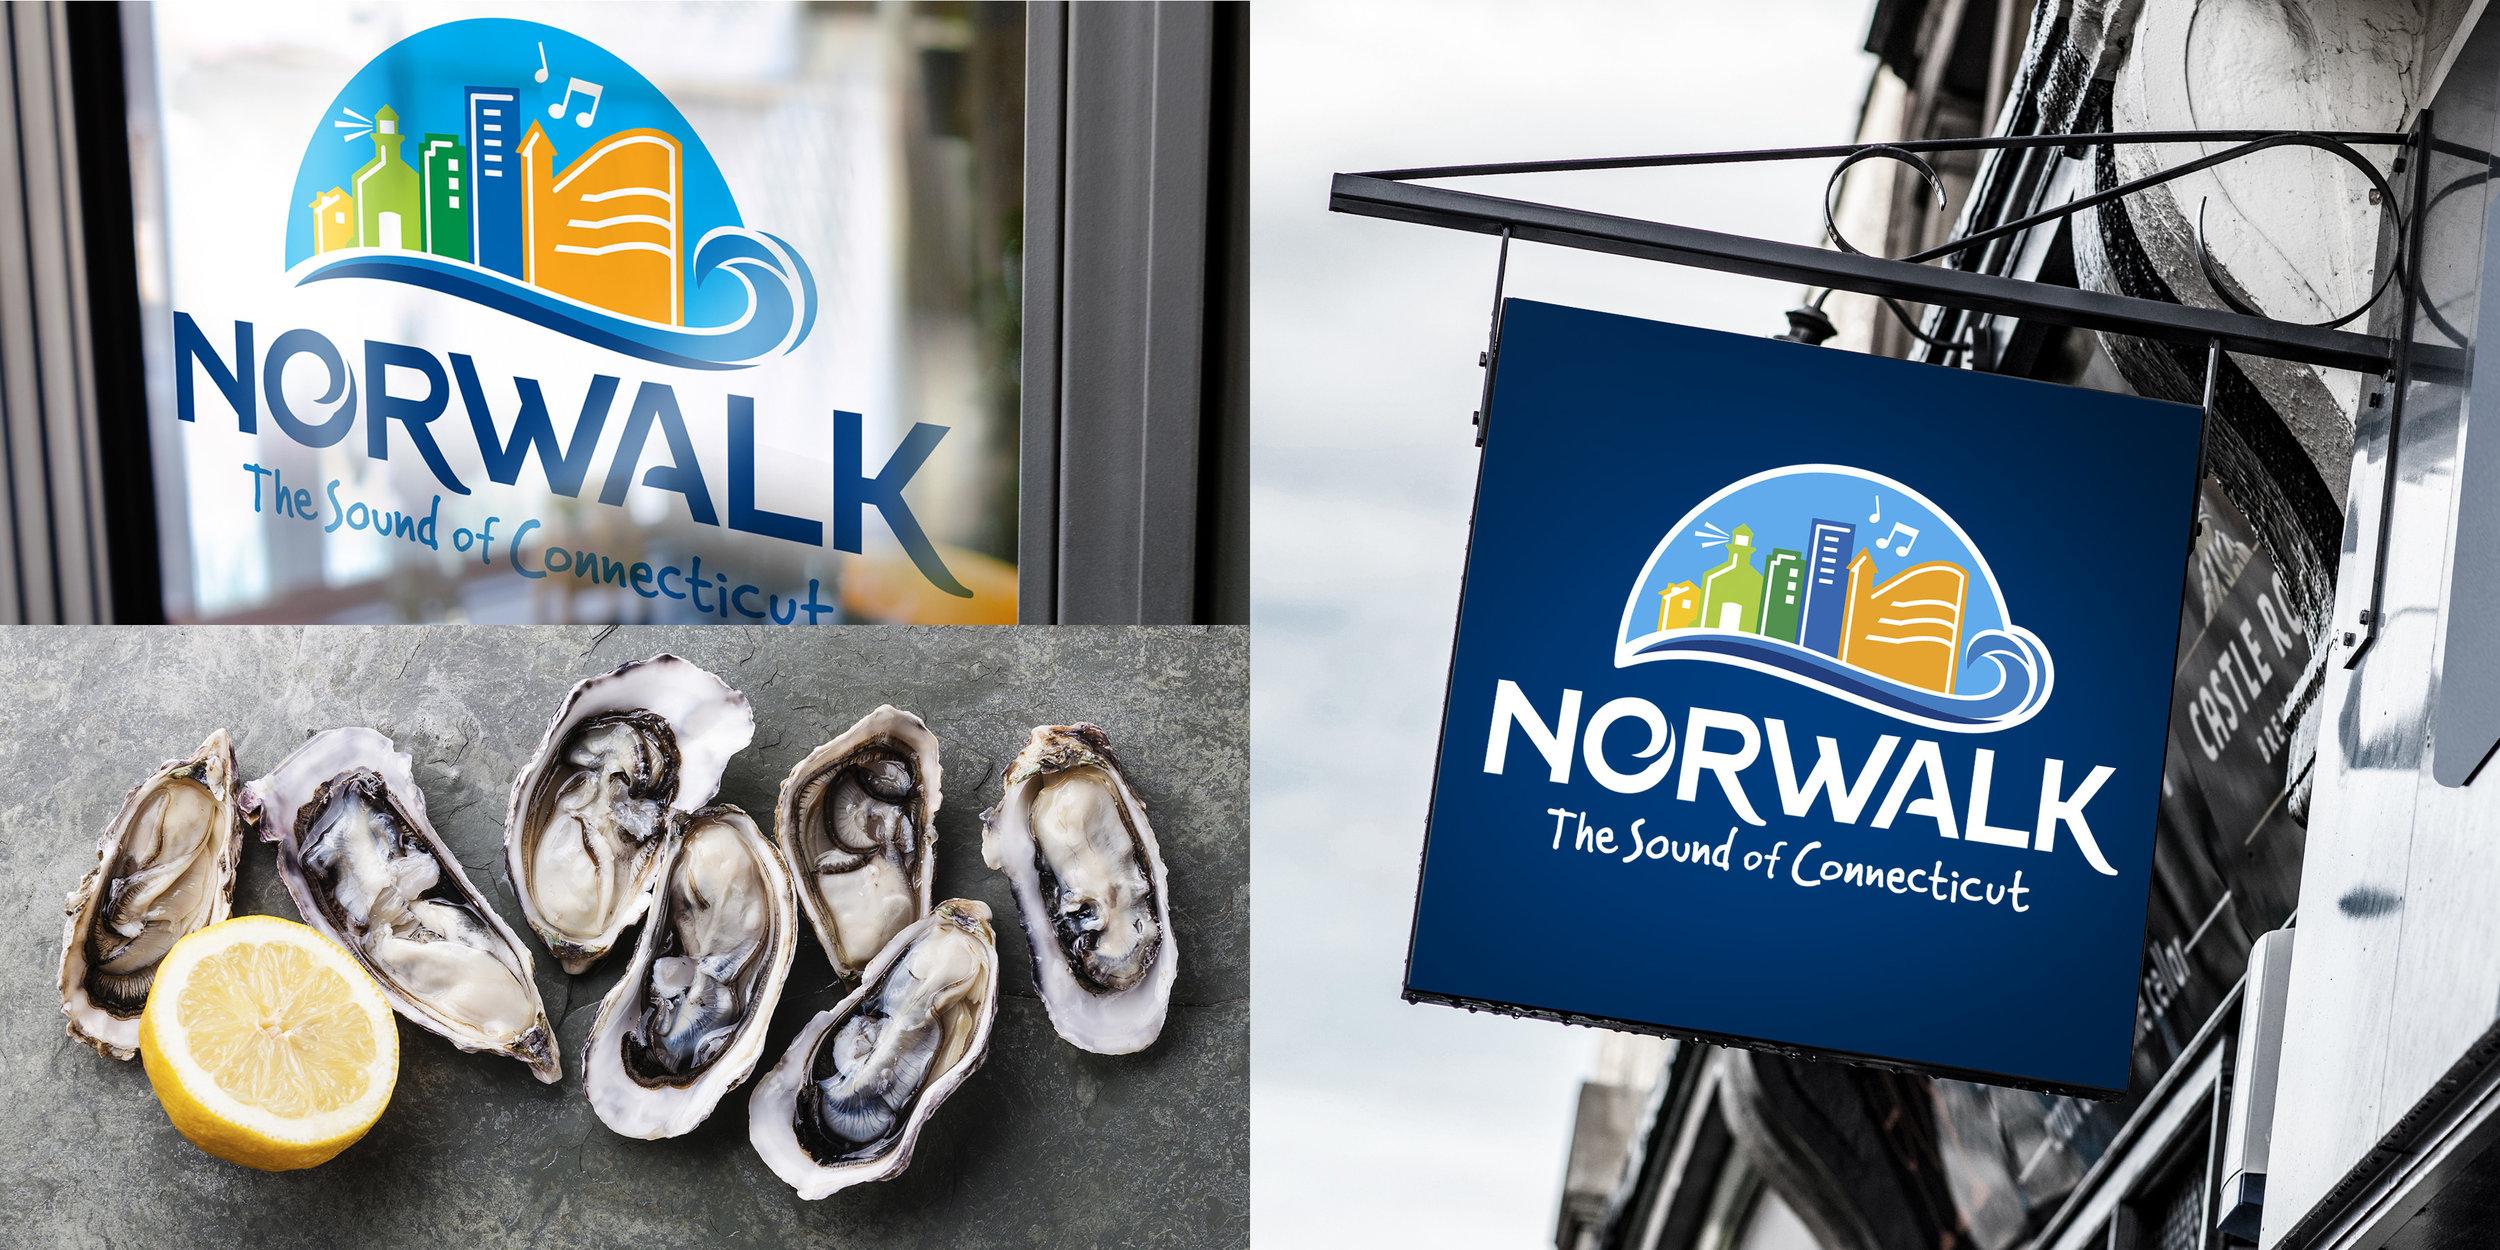 Norwalk_12x6_Signage.jpg